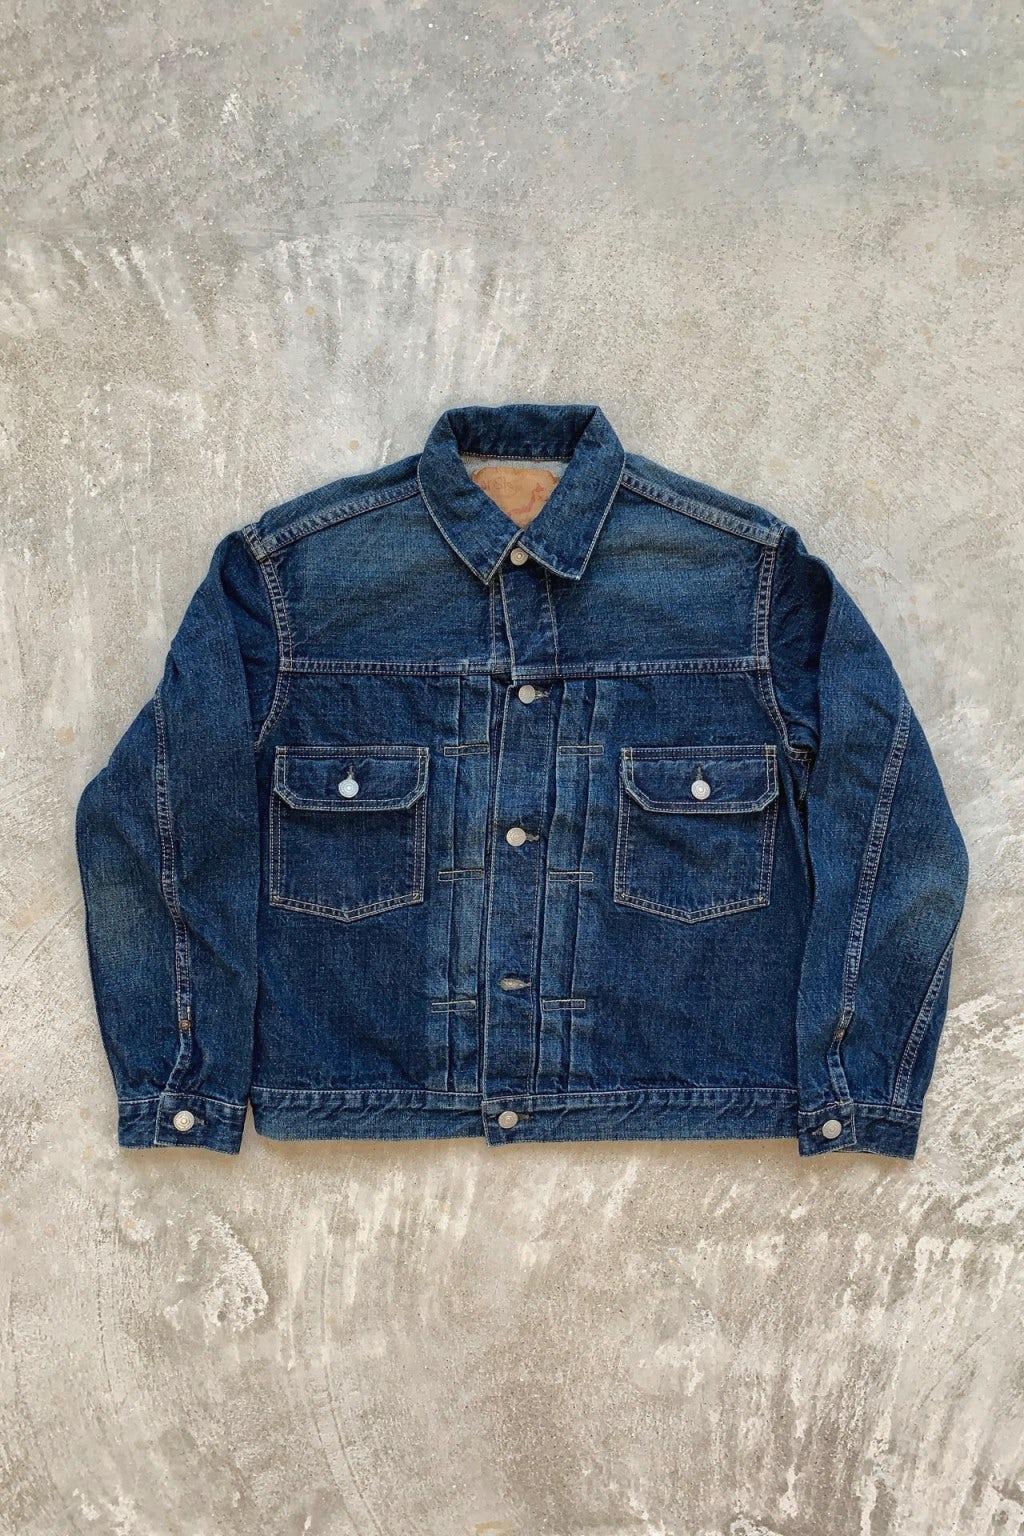 Orslow 50's Denim Jacket Type 2 Two Year Wash